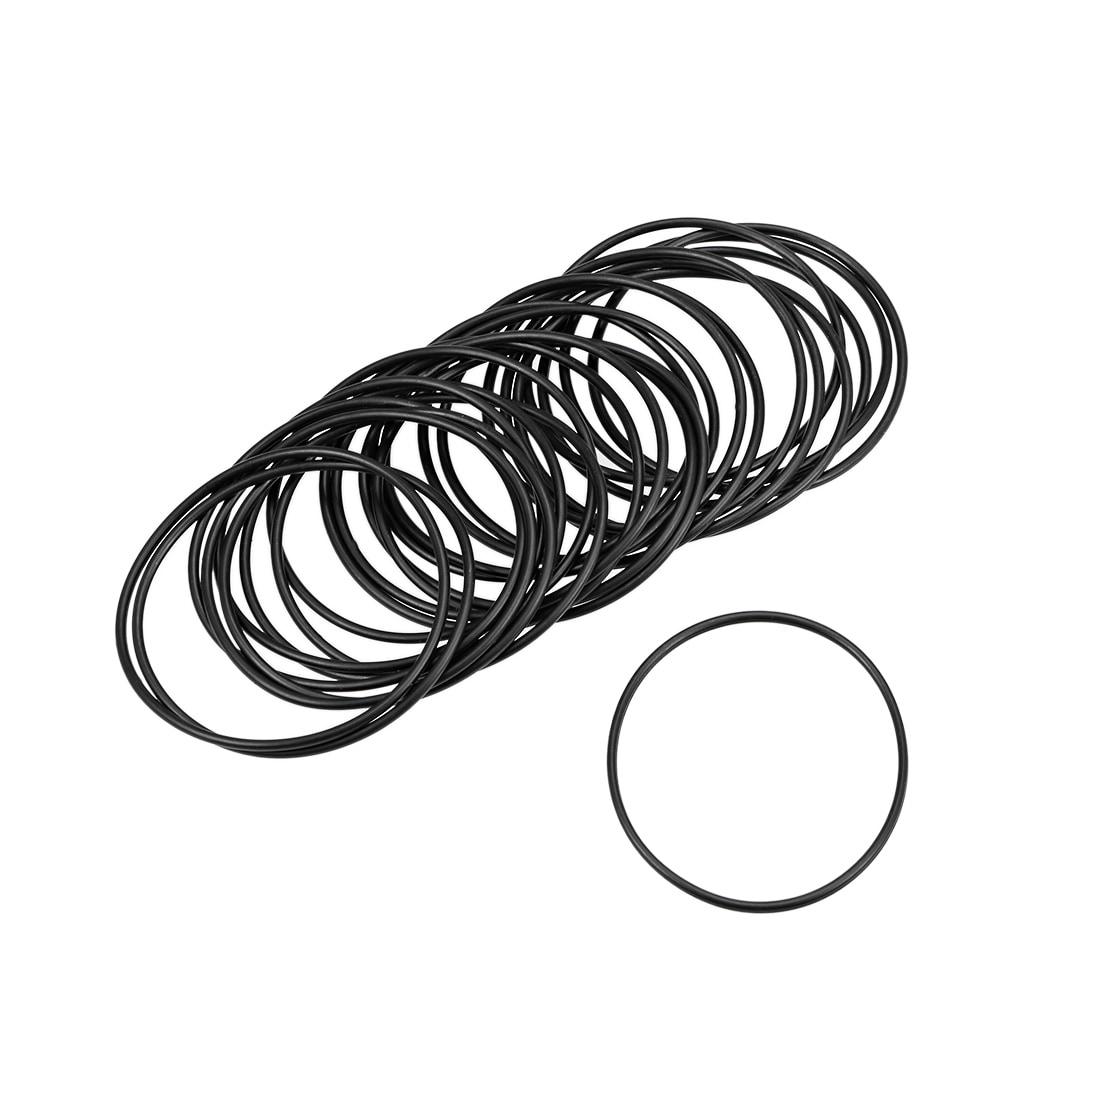 uxcell Nitrile Rubber O-Rings 41mm OD 35mm ID 3mm Width Pack of 10 Metric Buna-N Sealing Gasket